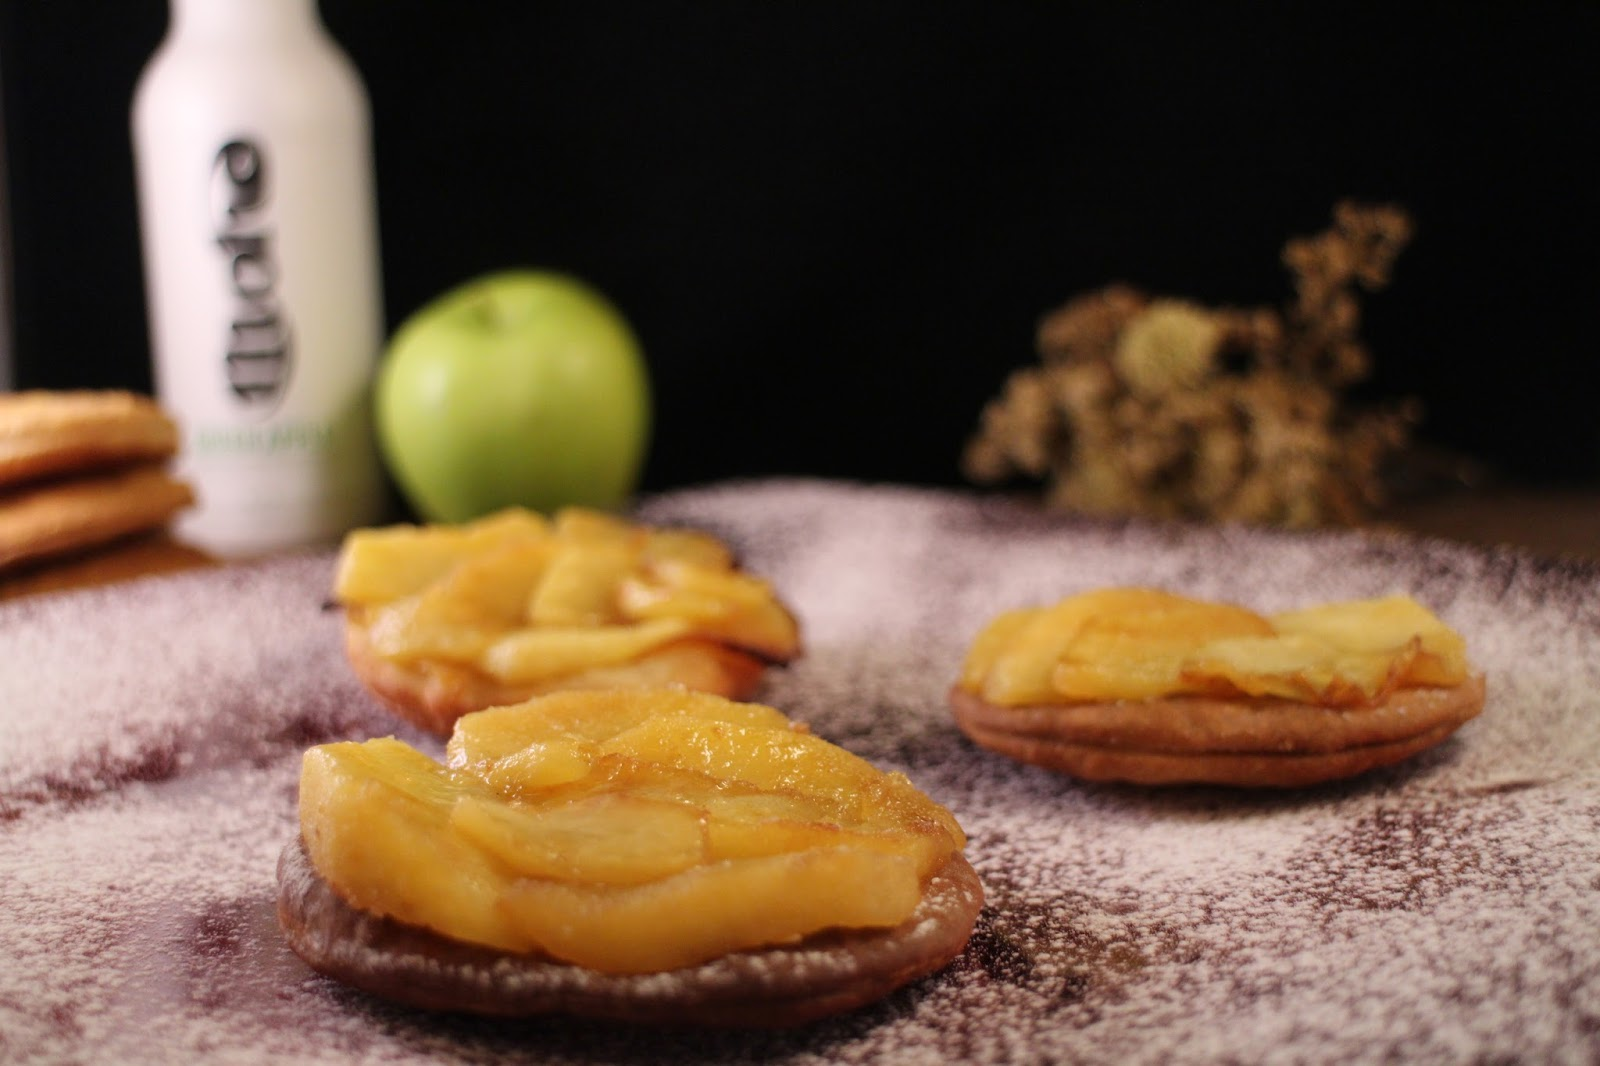 cider-apple-tarts, tartas-de-manzana-a-la-sidra